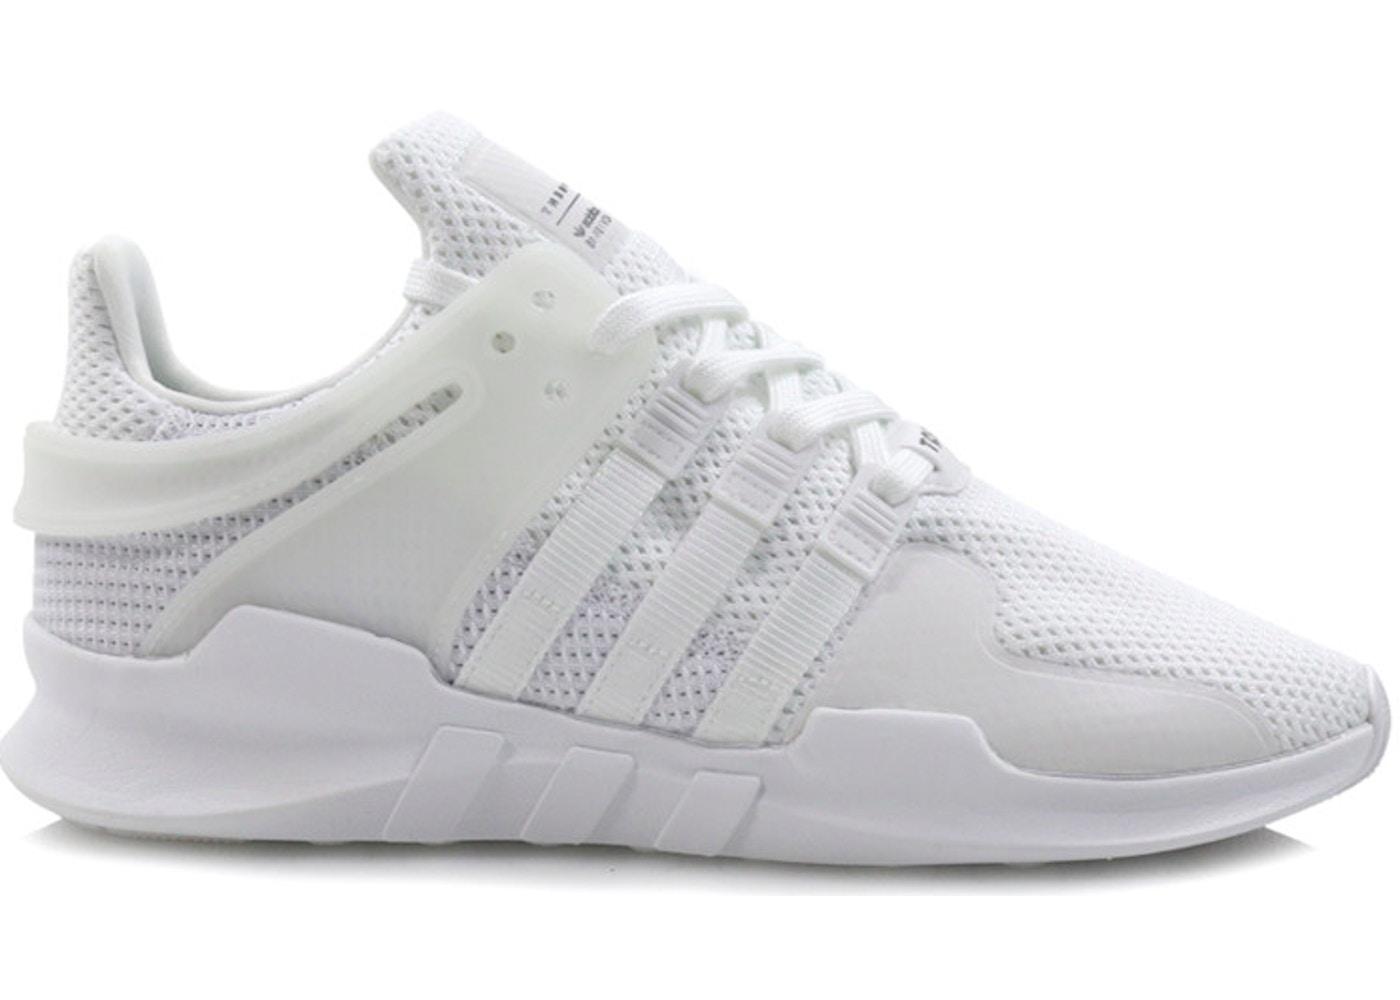 buy online 4122d 02f32 HypeAnalyzer · adidas EQT Support ADV Triple White